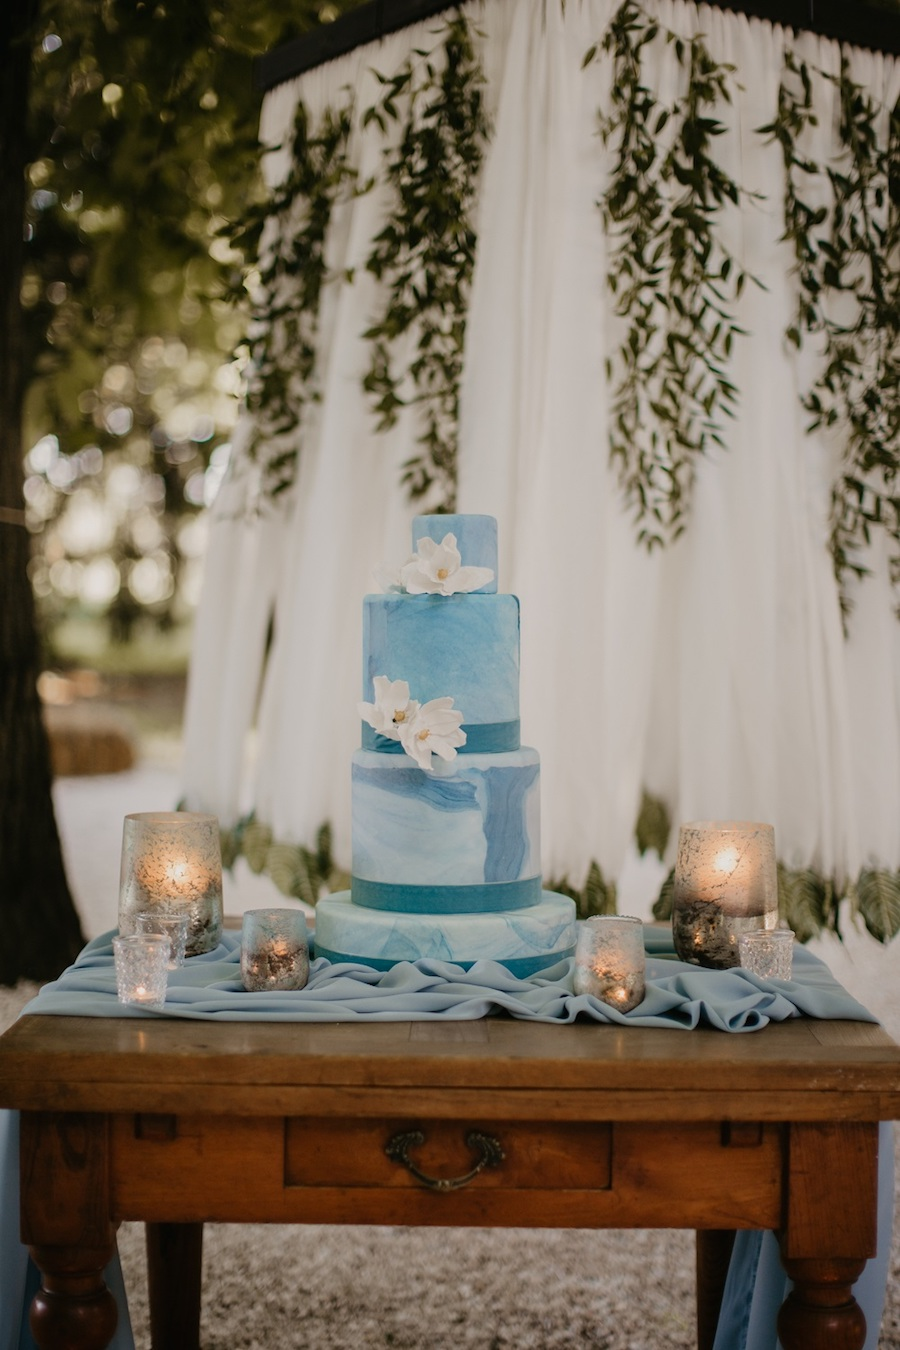 wedding cake azzurro acquerello